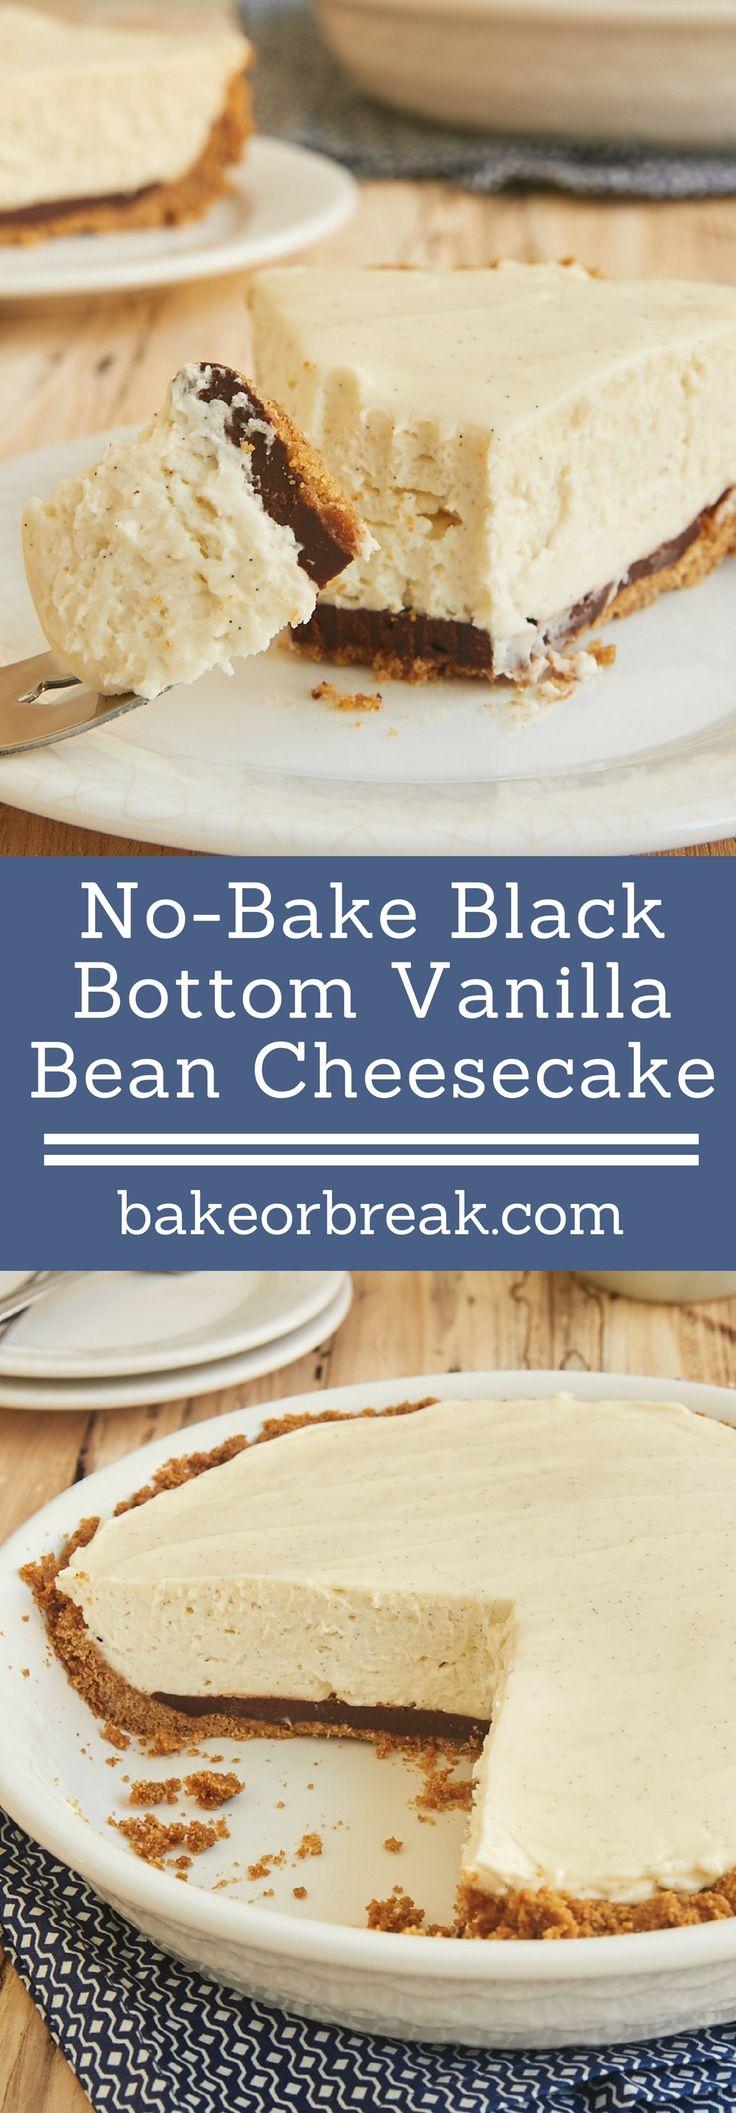 731 best Cream Cheese Desserts images on Pinterest | Cheesecake ...